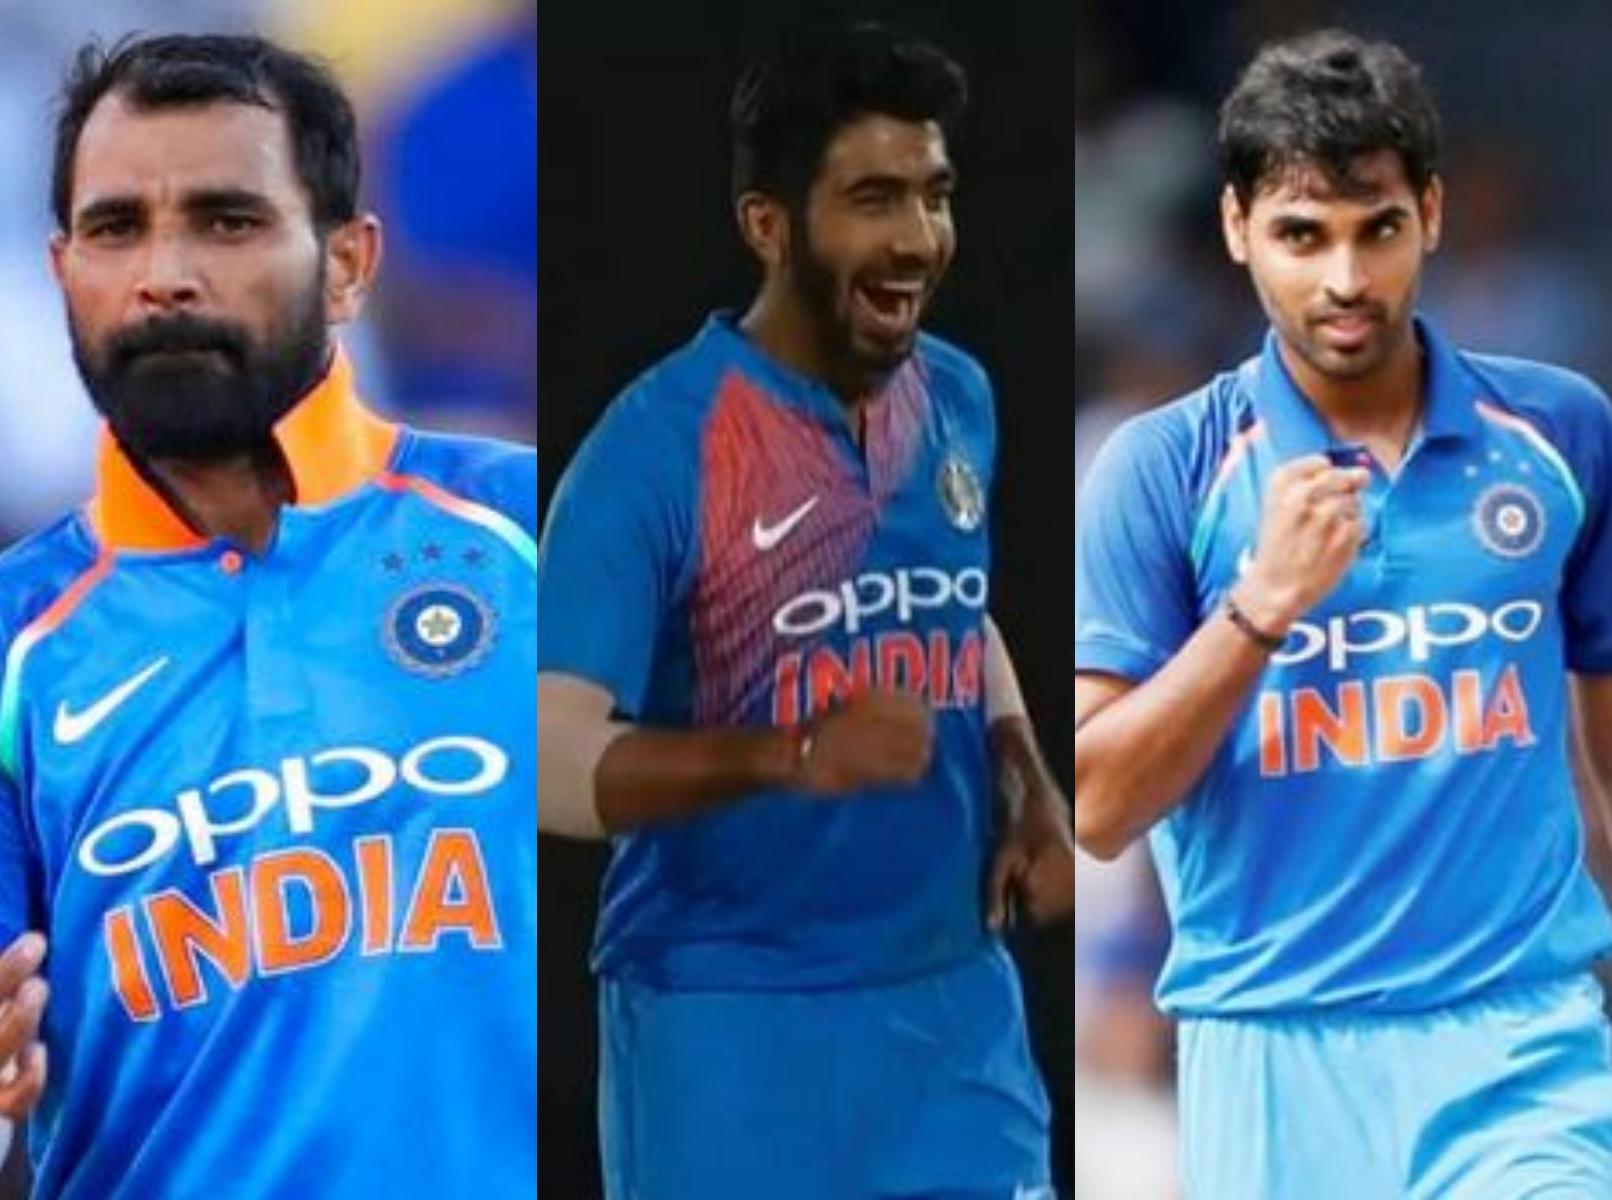 Indian Team management has asked IPL teams to take care of Shami, Bumrah and Bhuvneshwar